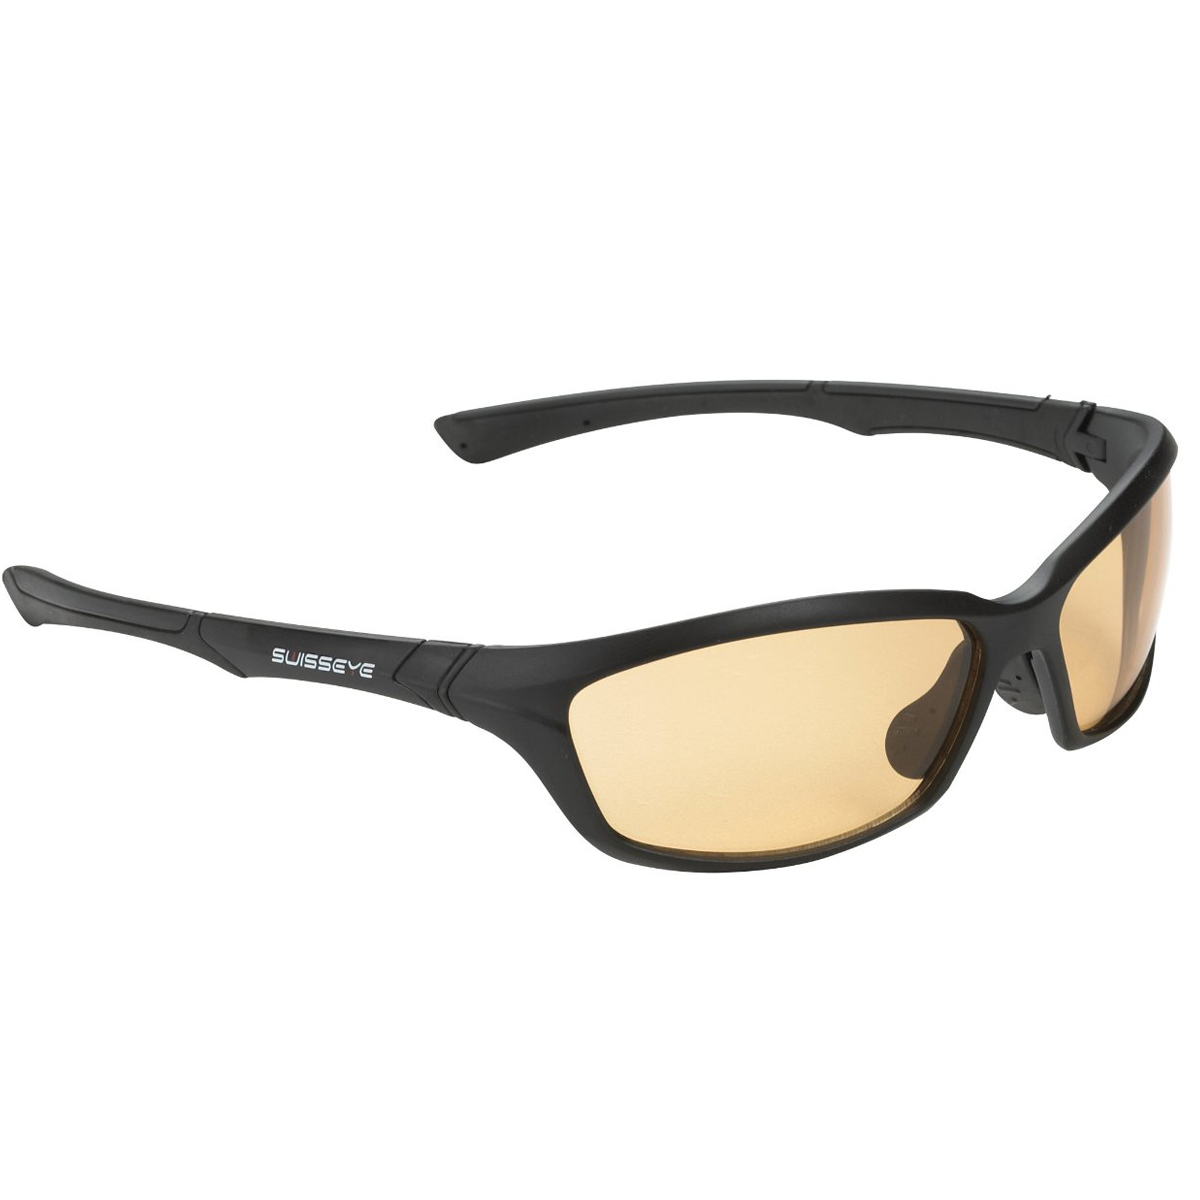 Swiss Eye Drift Sunglasses - Photochromic Orange Smoke ...